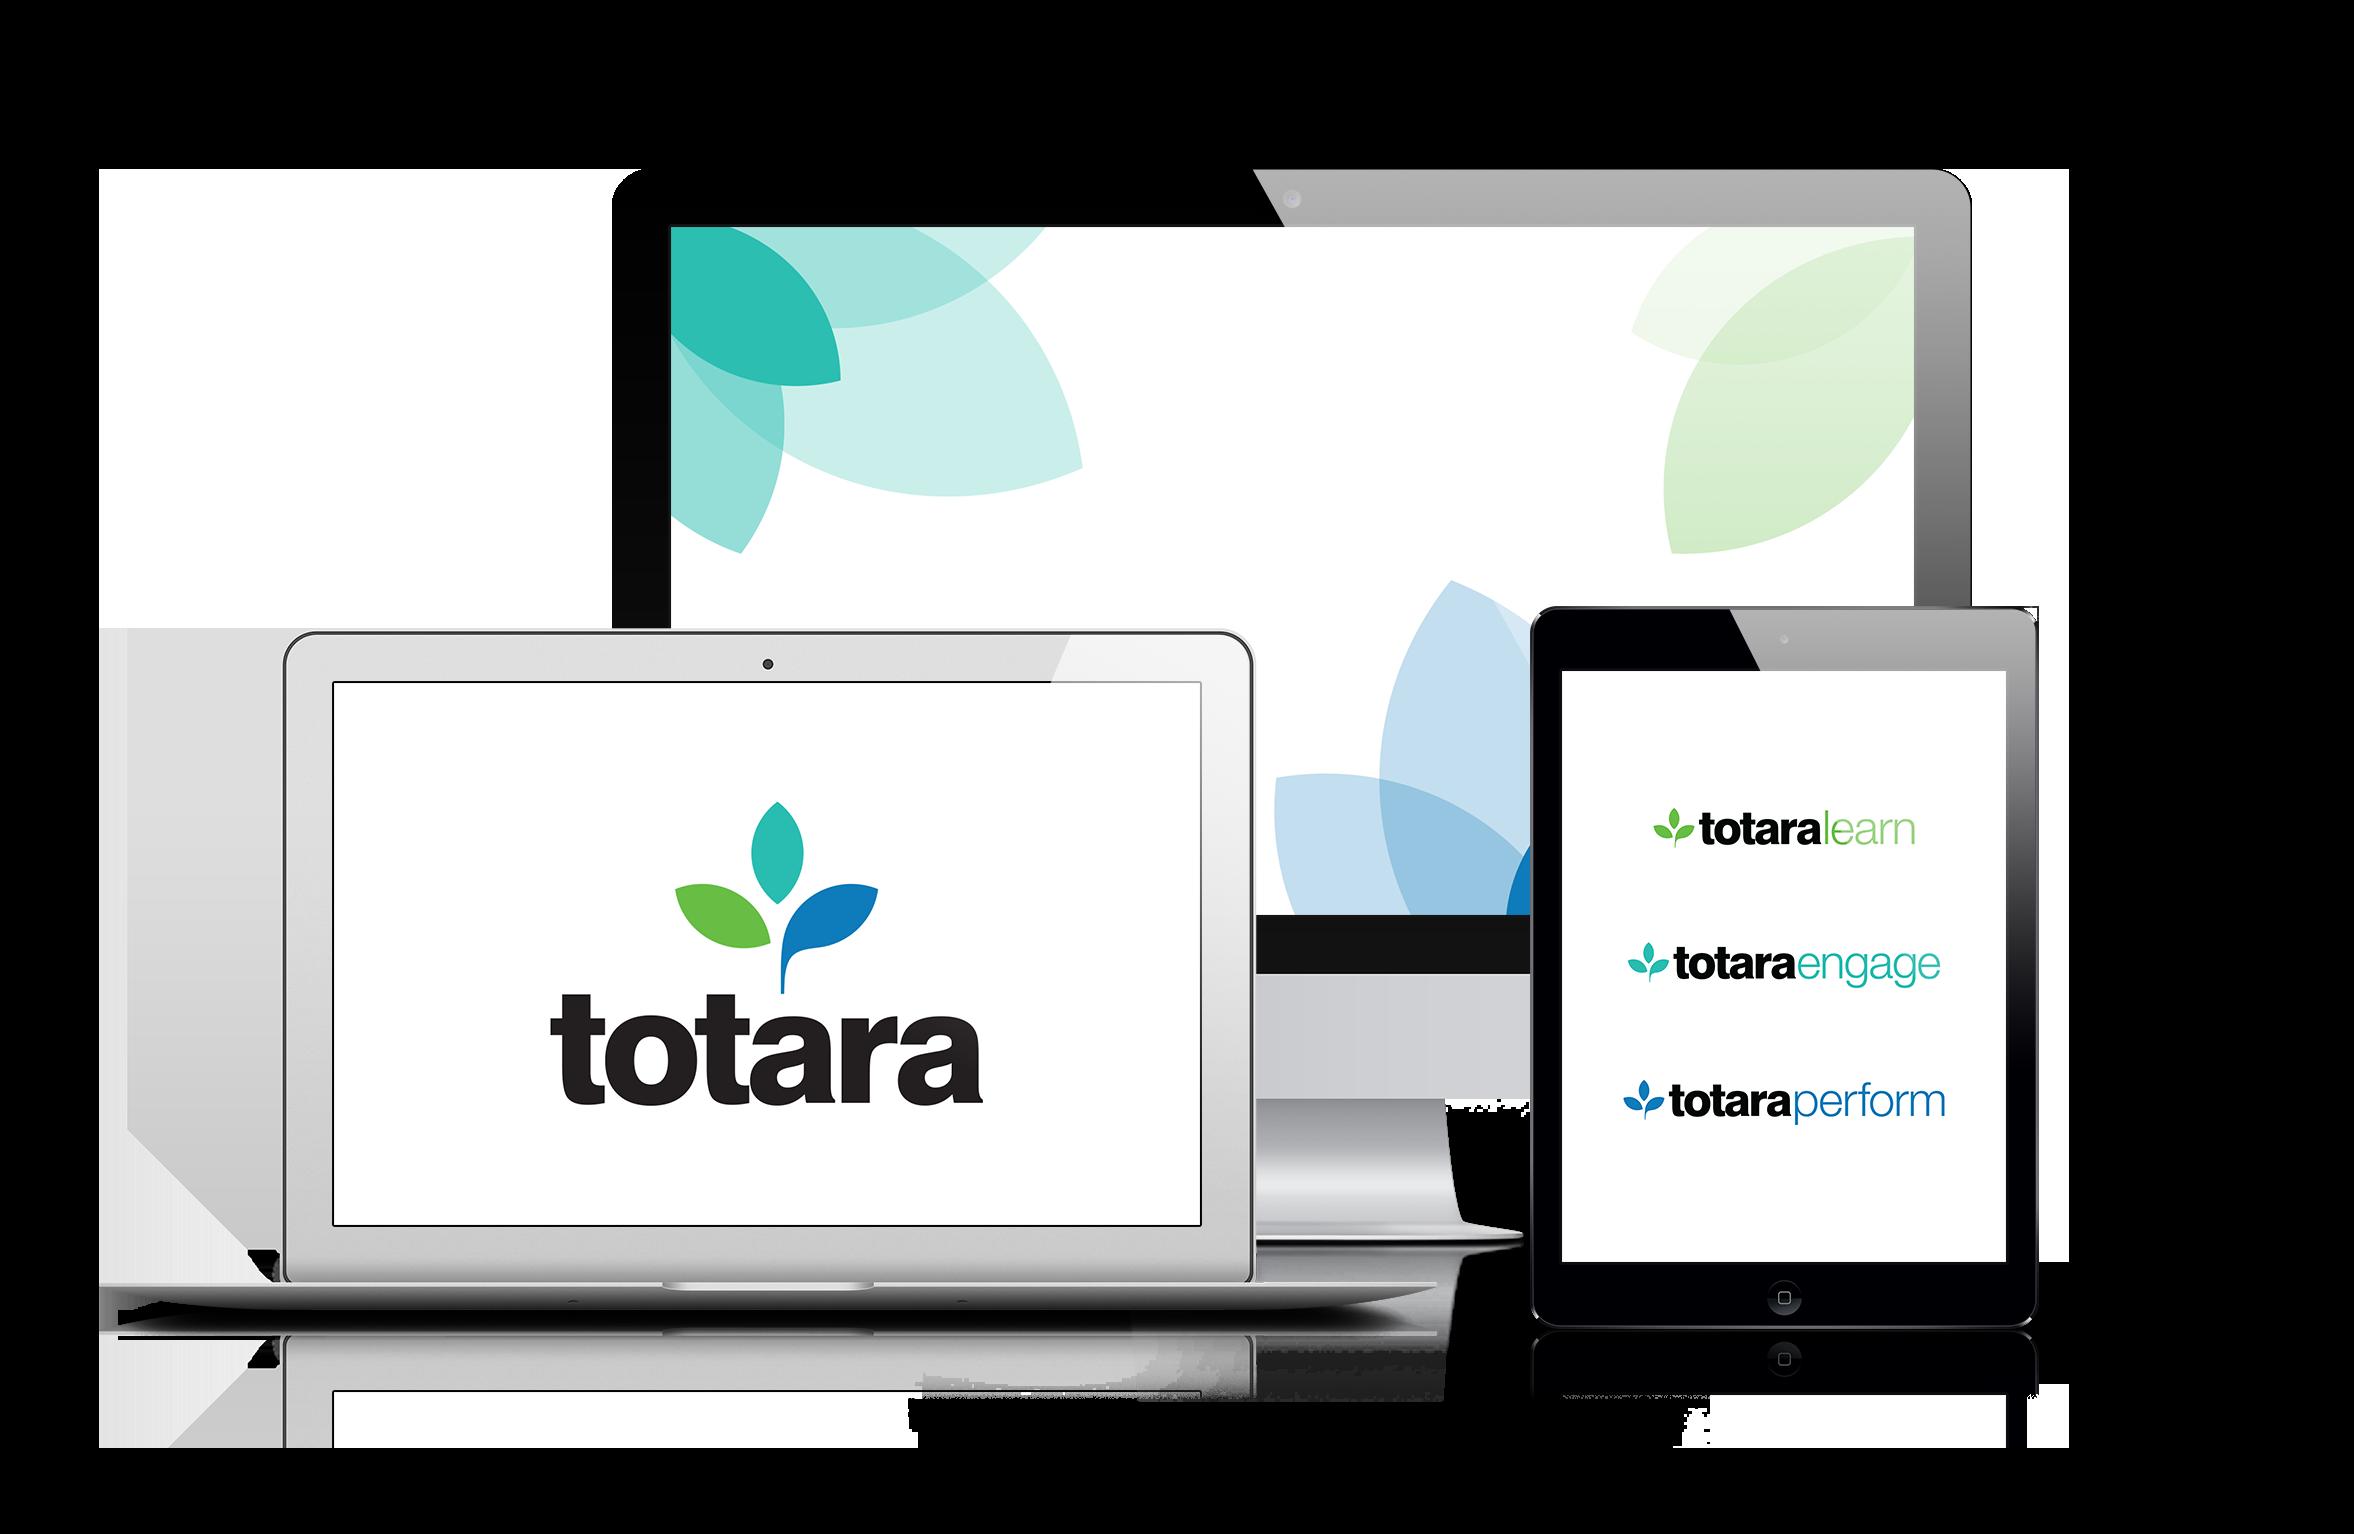 totara-txp-logoscreens